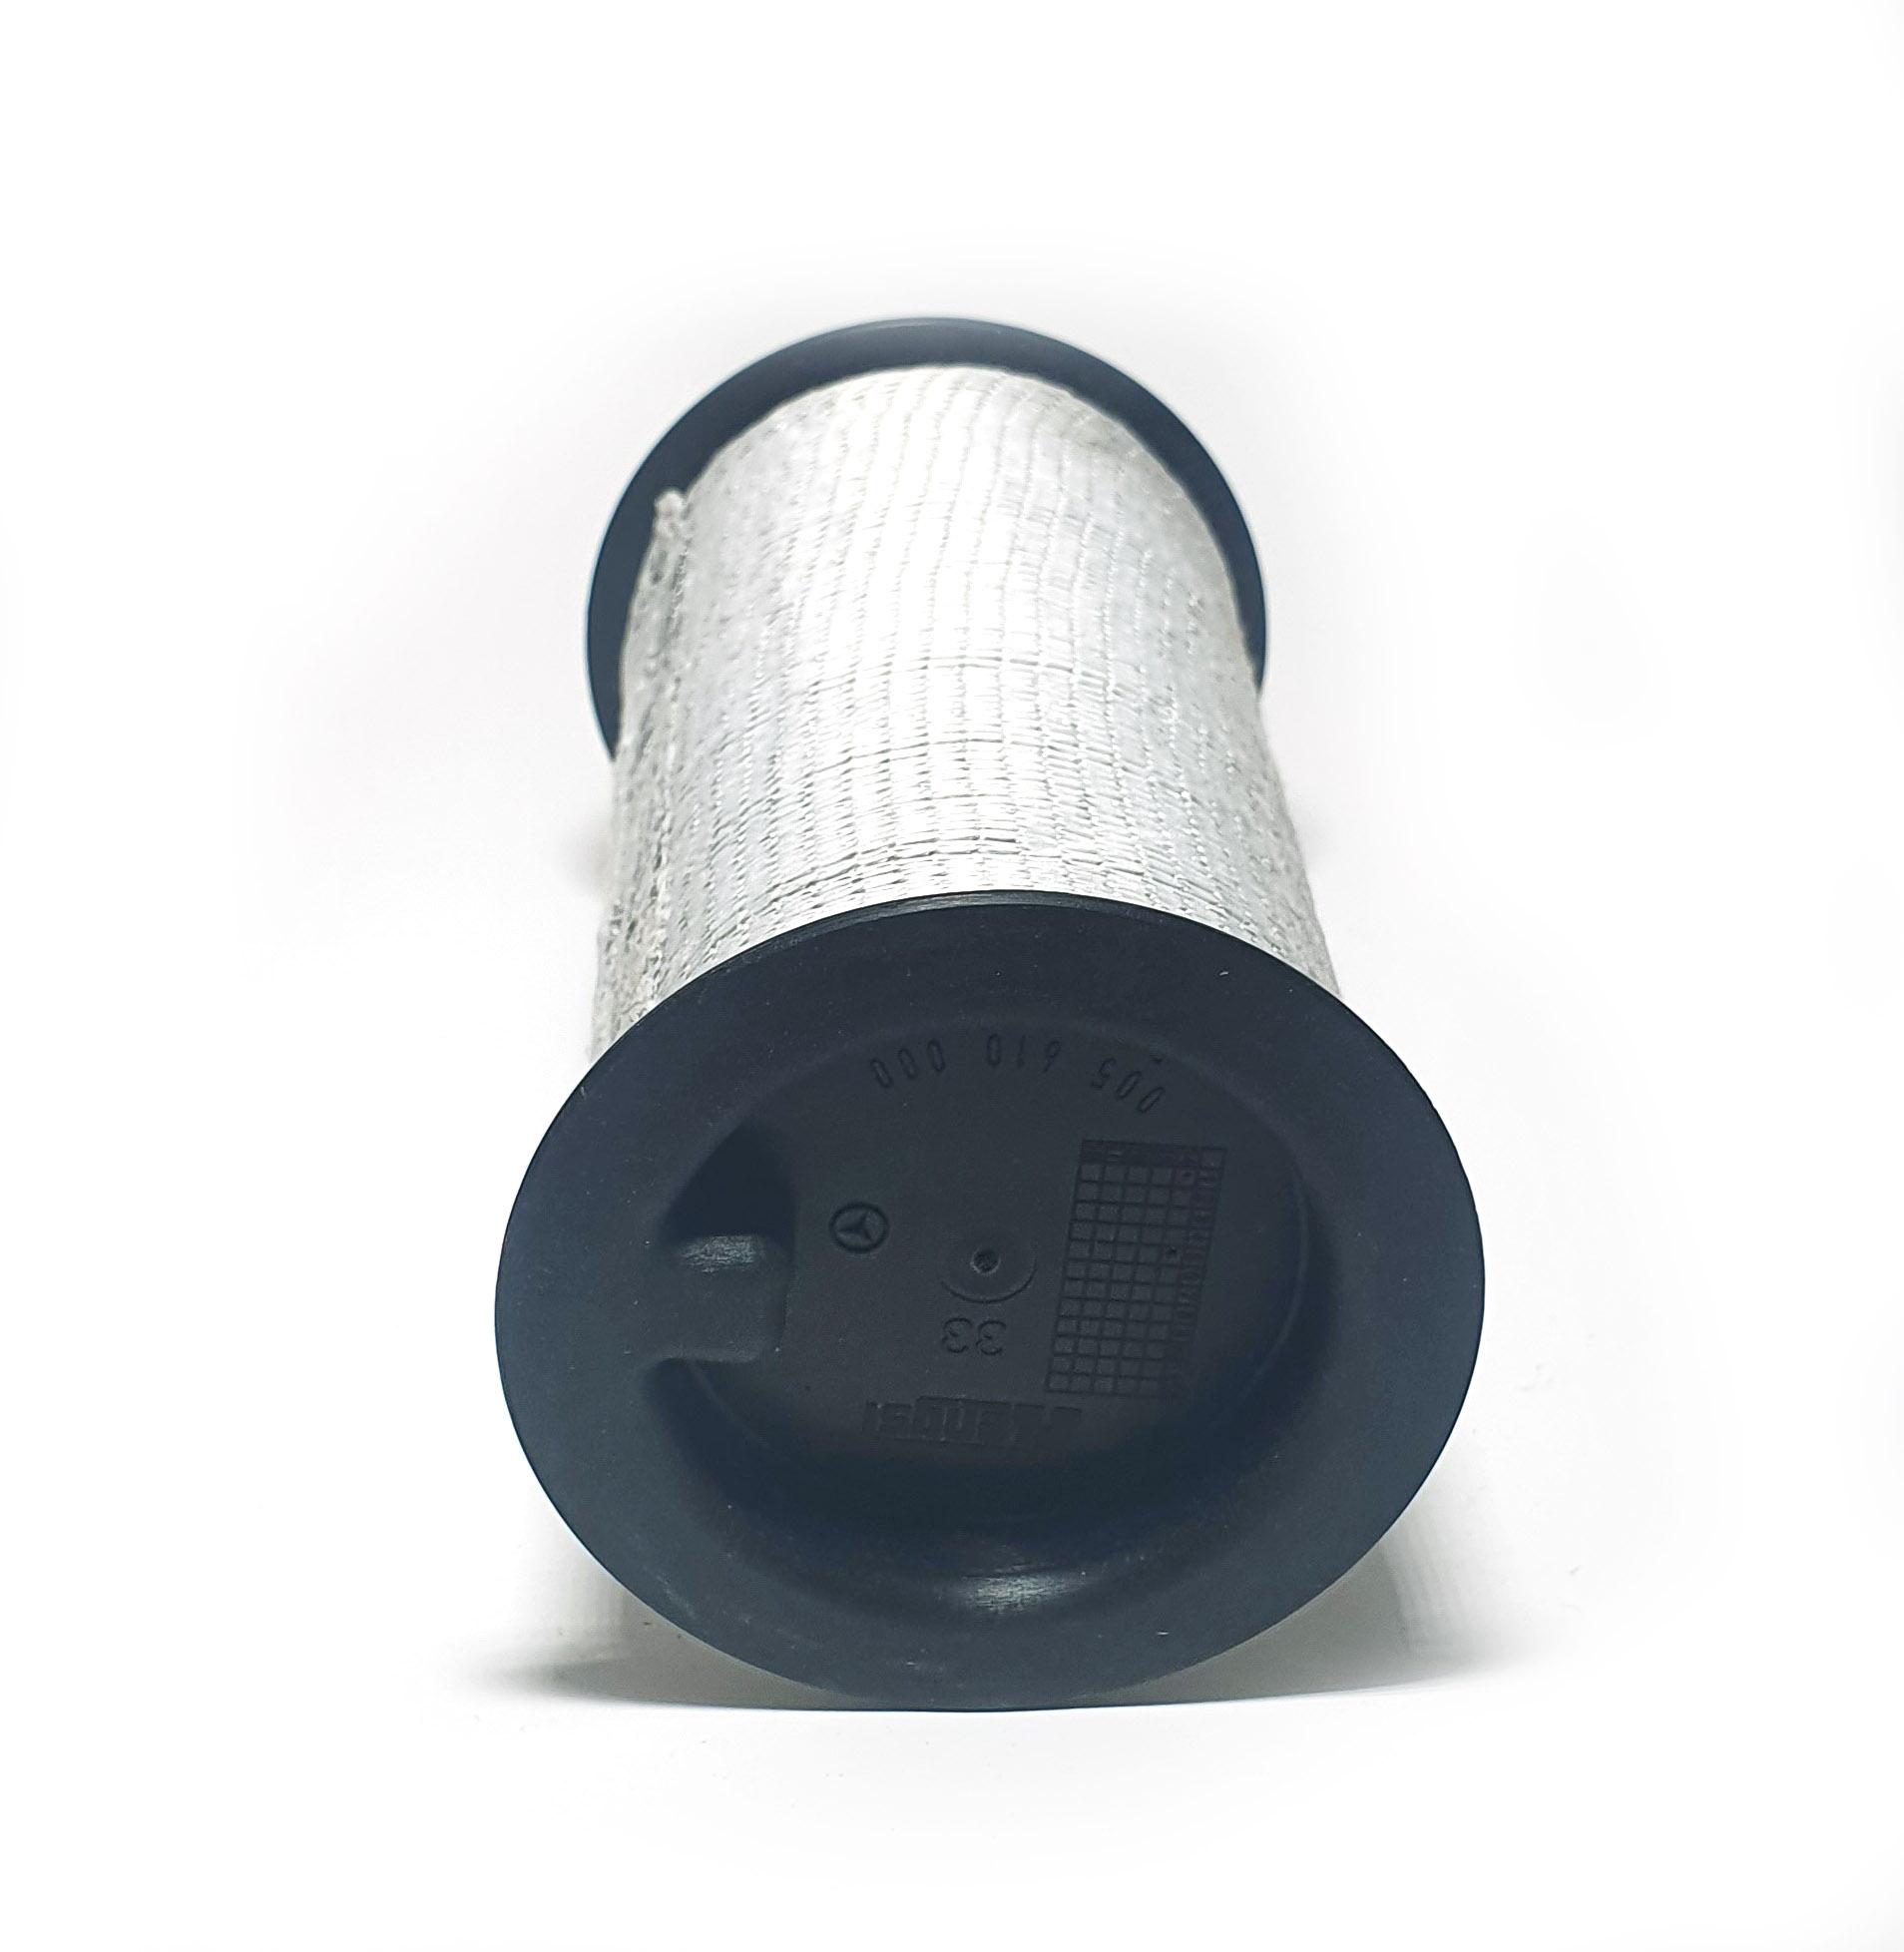 filtro separador blow by mtu serie 2000 - pn 5200180035